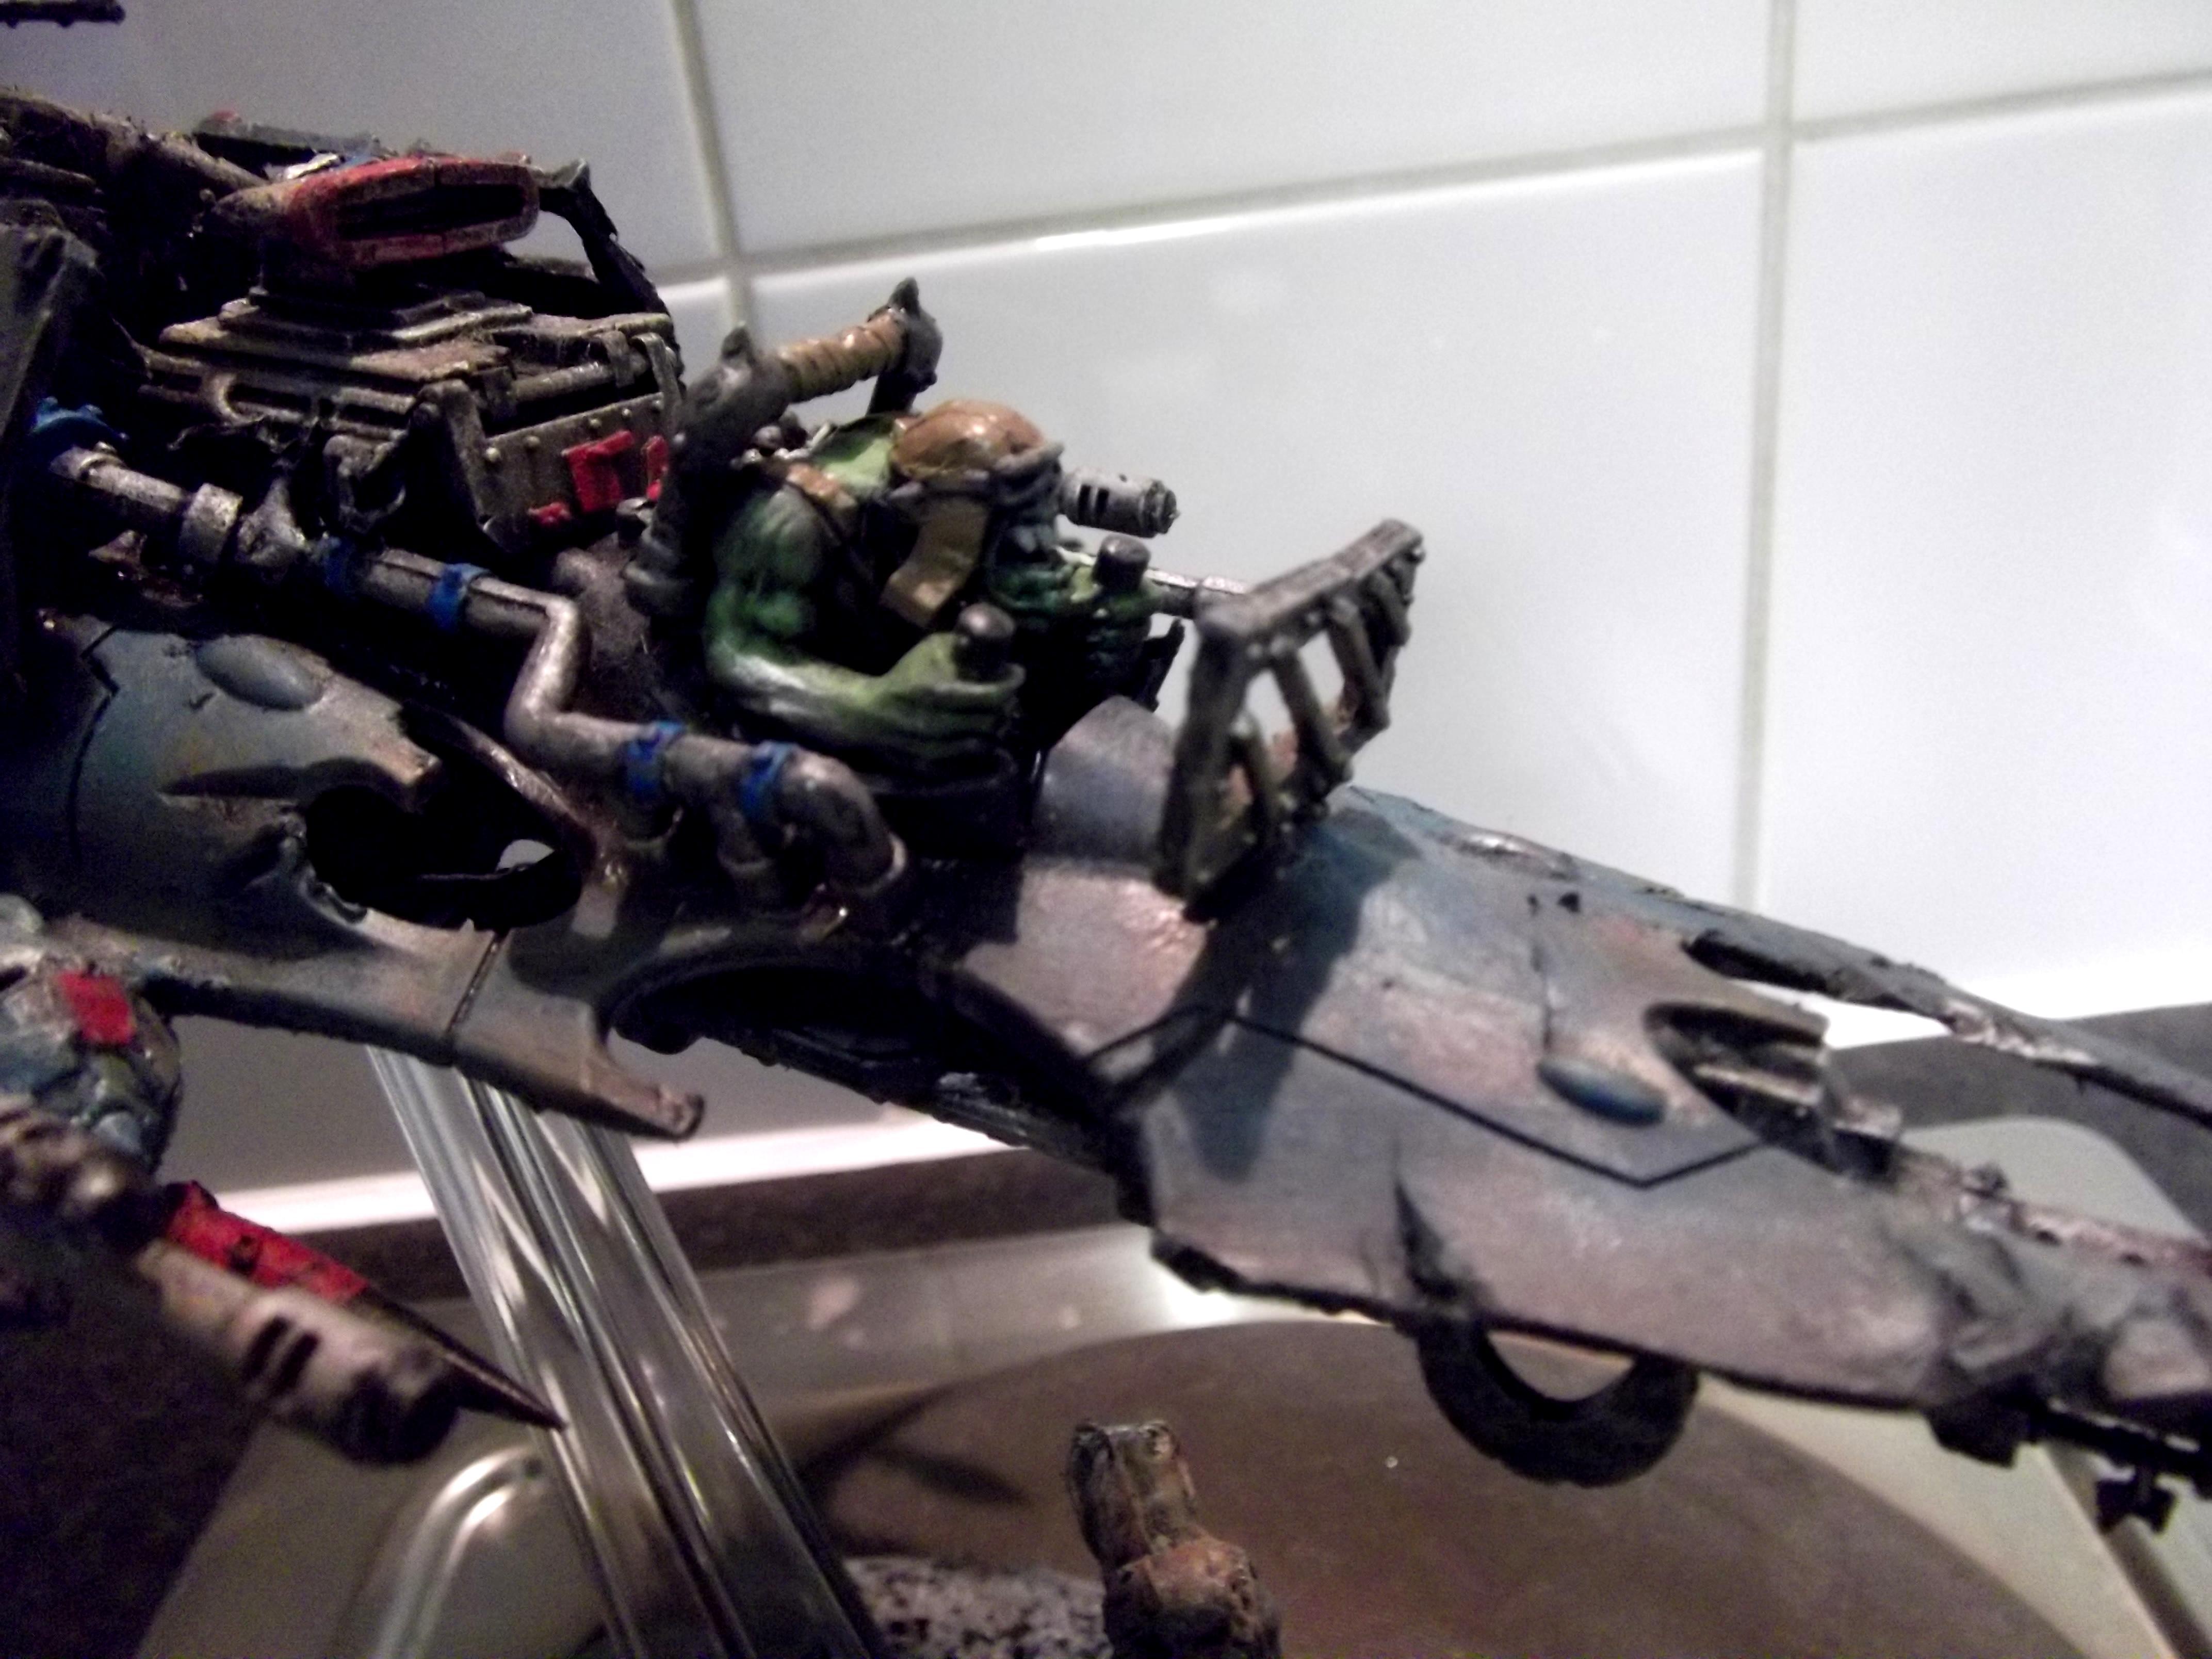 Conversion, Dakkjet, Dark Eldar, Jetfighter, Looted, Orks, Razorwing, Scratch Build